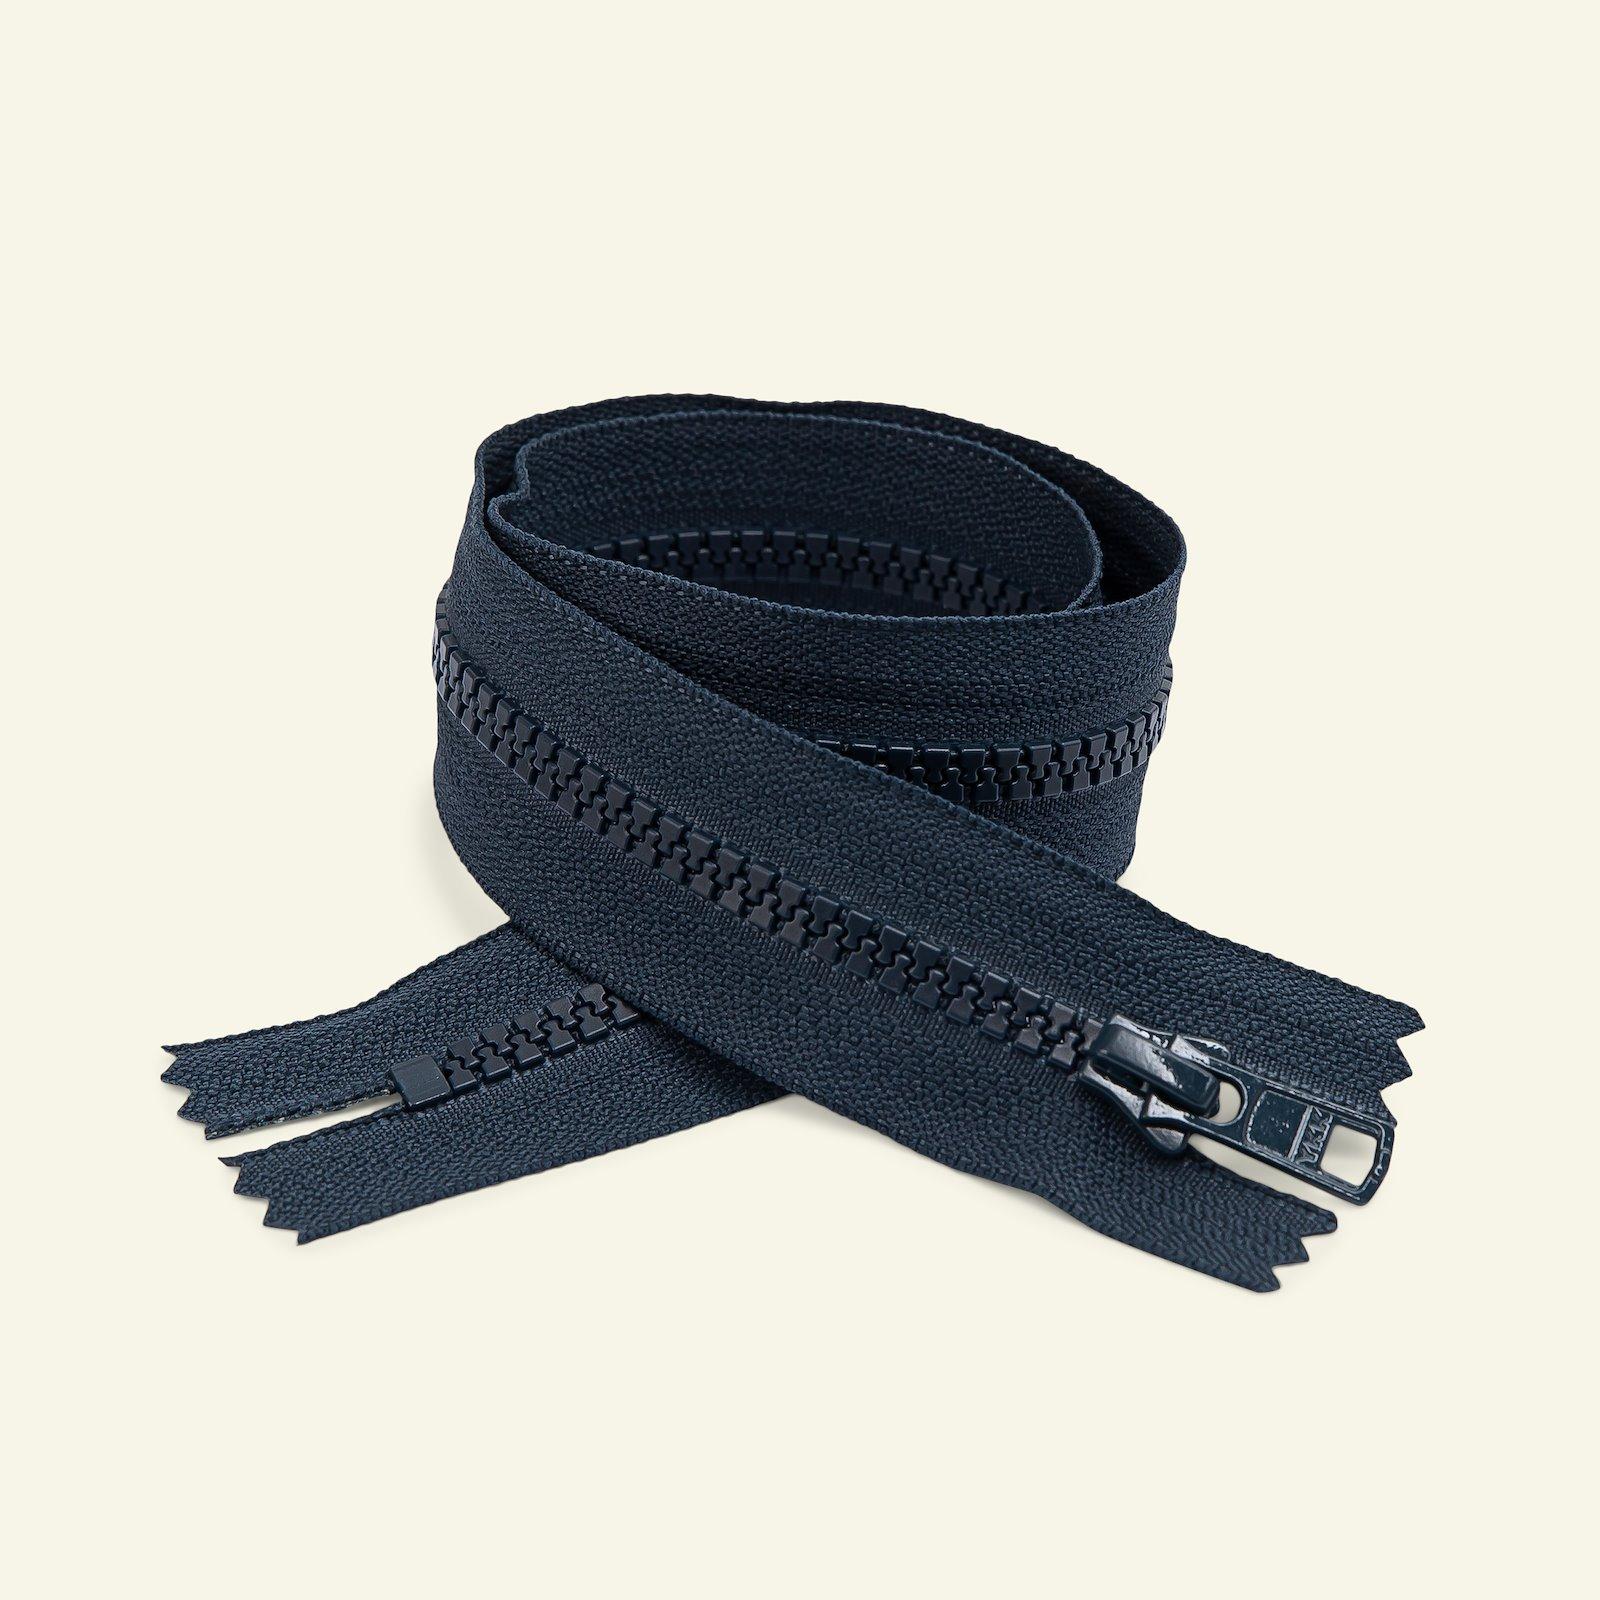 YKK zip 6mm closed end 30cm navy x50123_pack